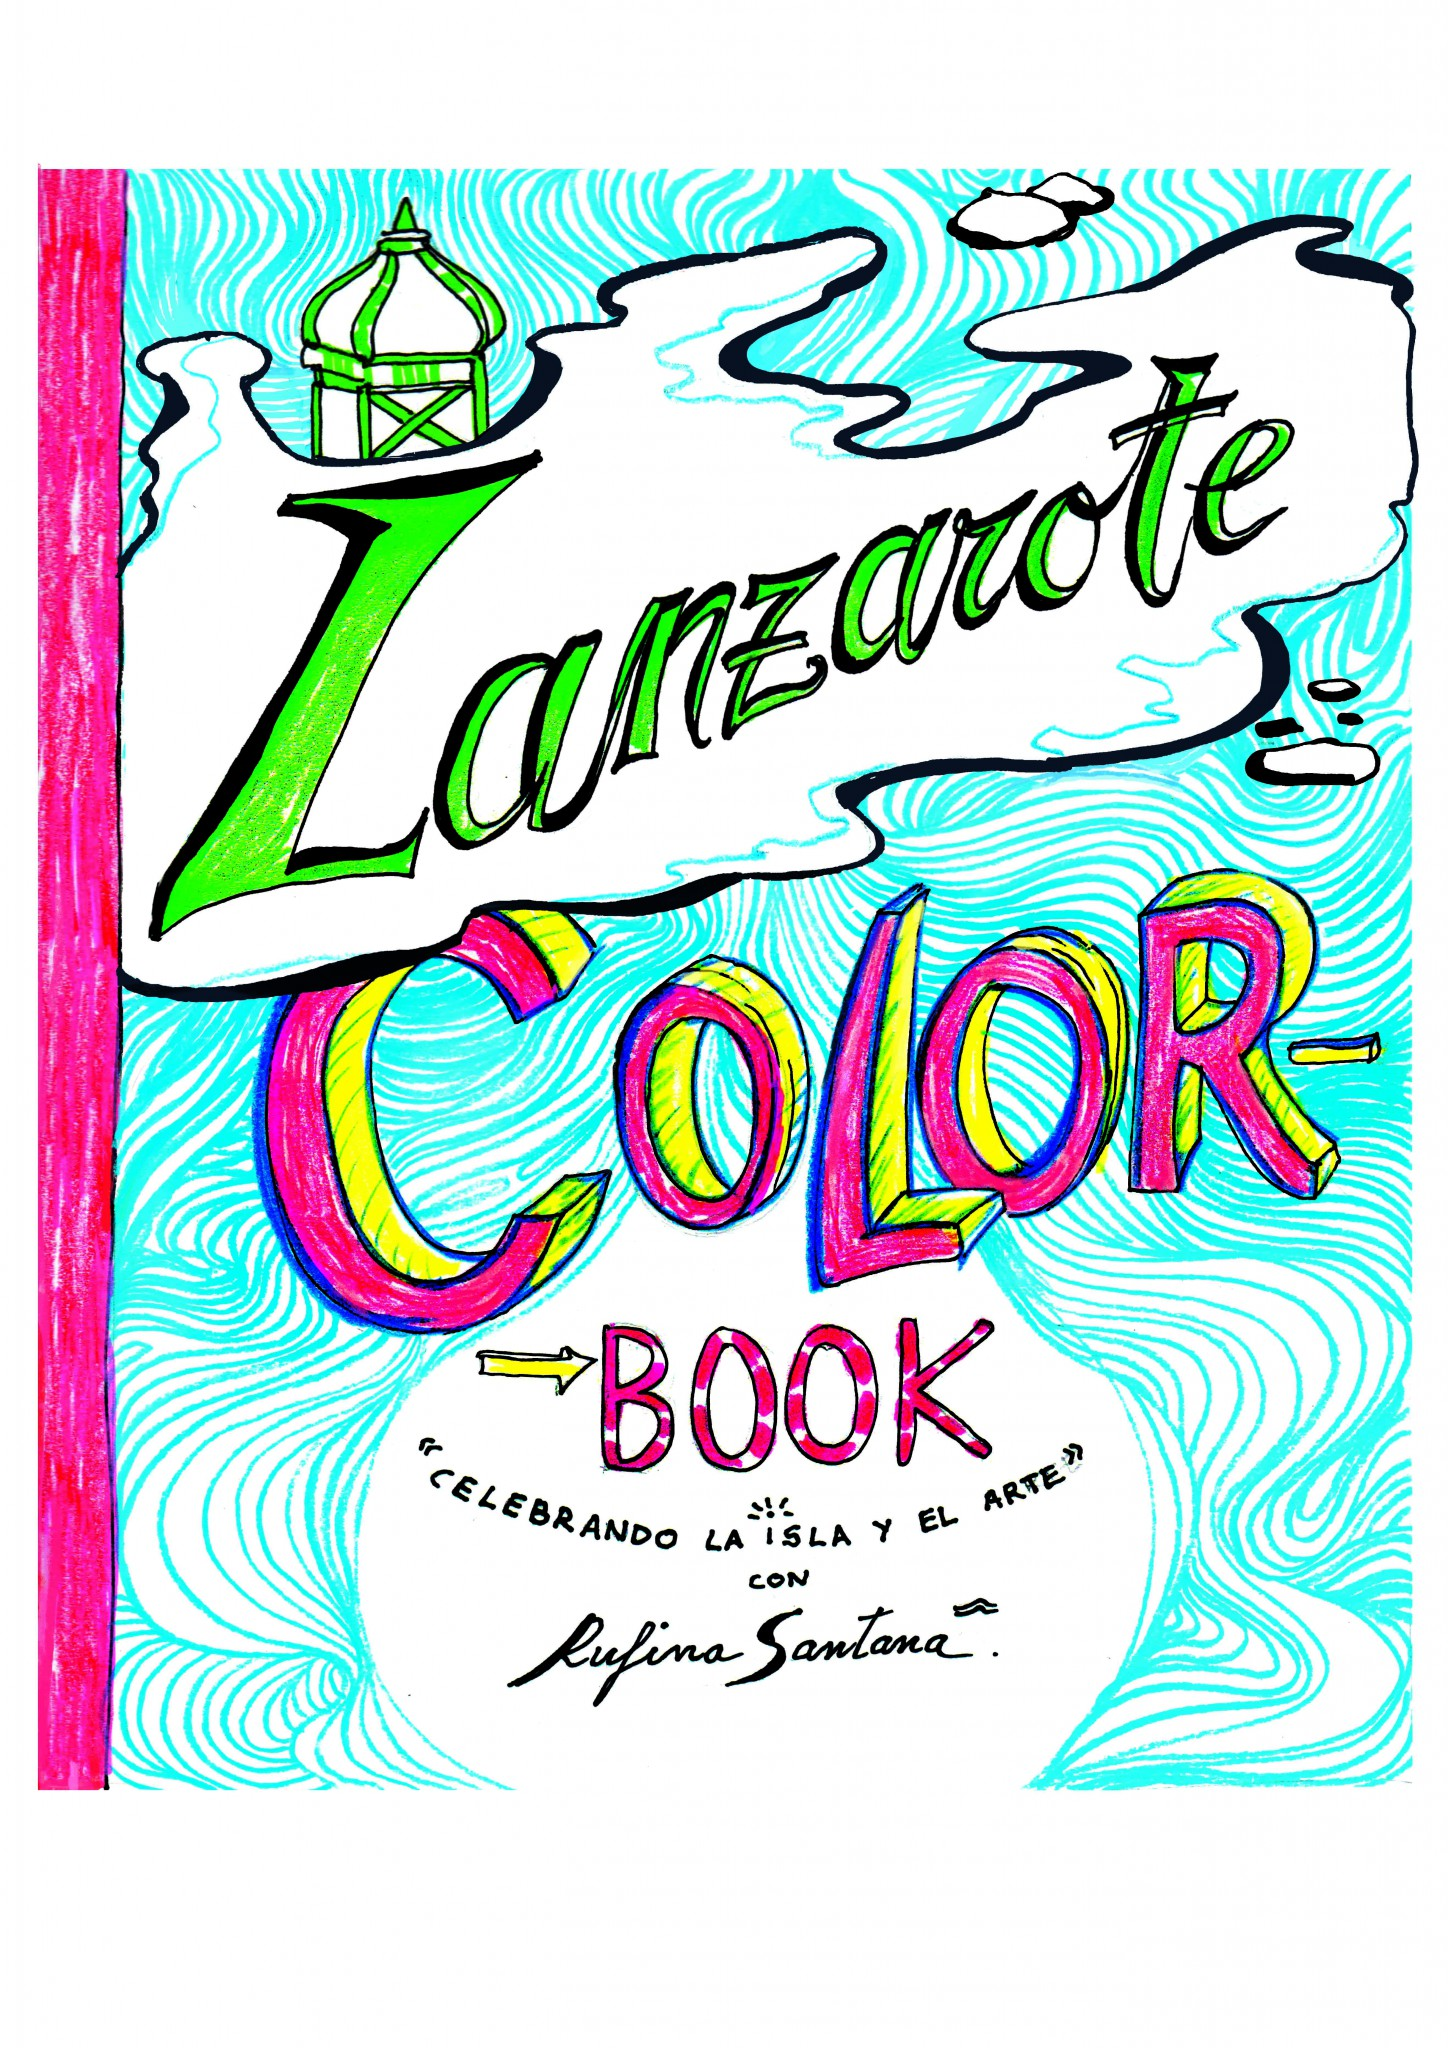 Rufina Santana | RUFINA SANTANA edita LANZAROTE.COLORBOOK, un libro ...